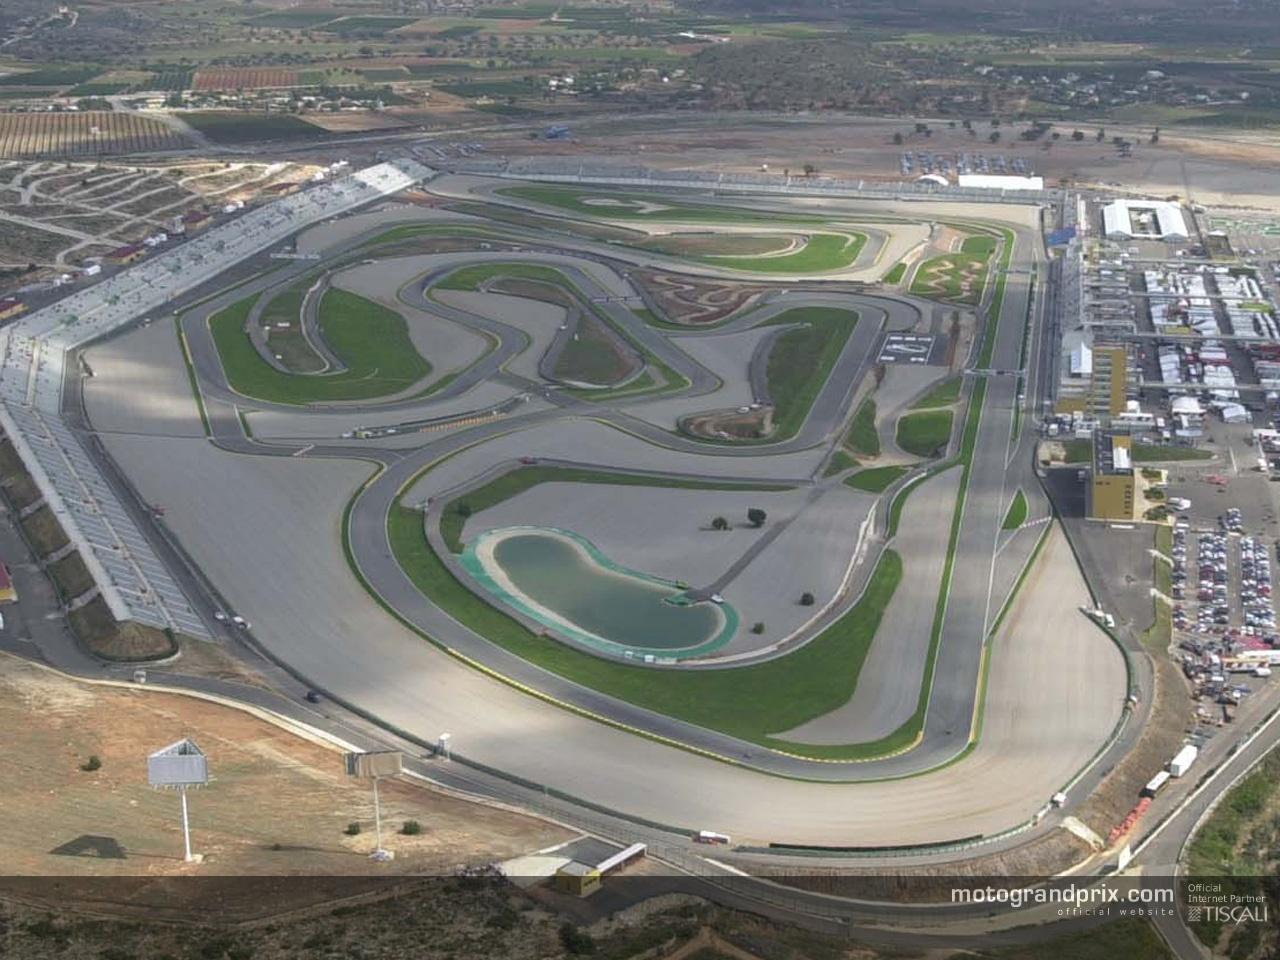 Circuito Cheste : Campeonato del mundo de motociclismo el circuito de cheste